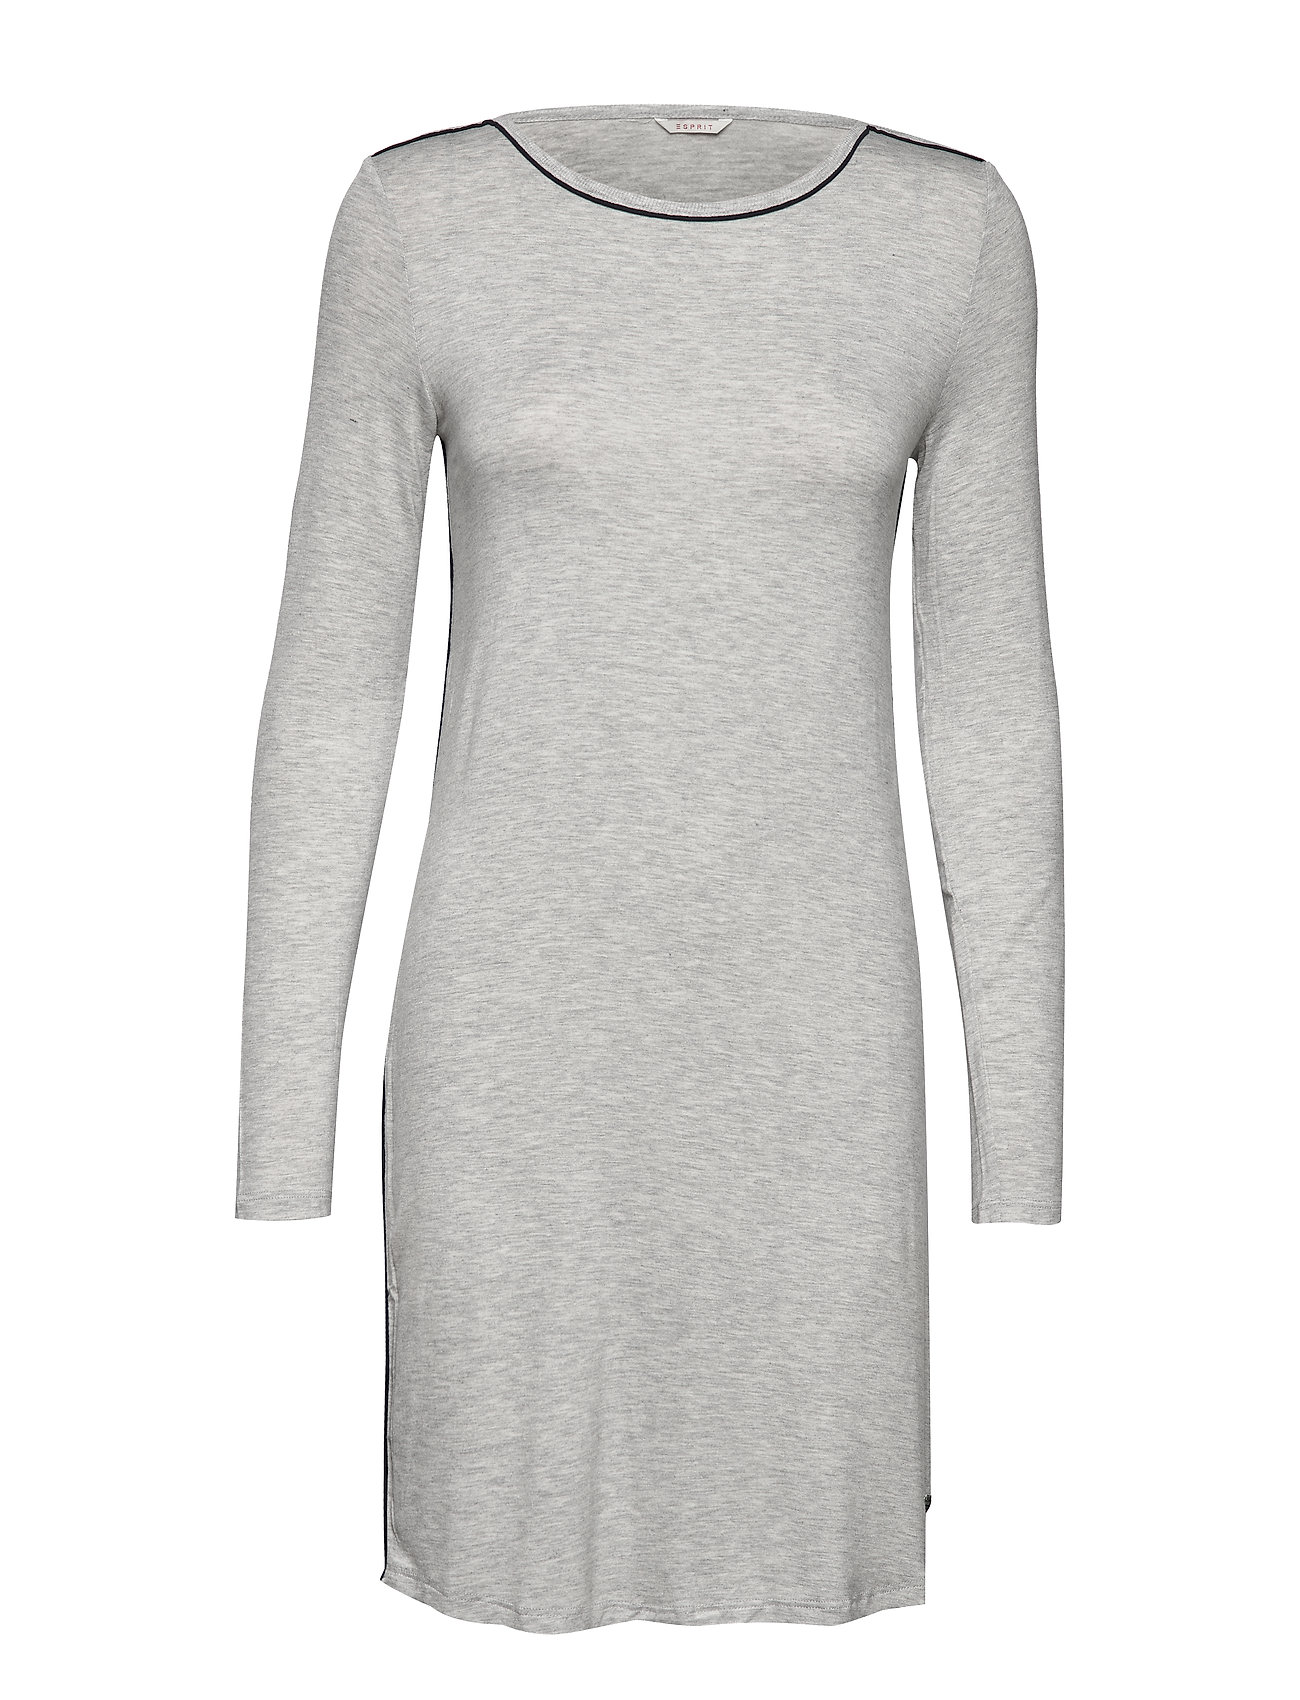 Esprit Bodywear Women Nightshirts - LIGHT GREY